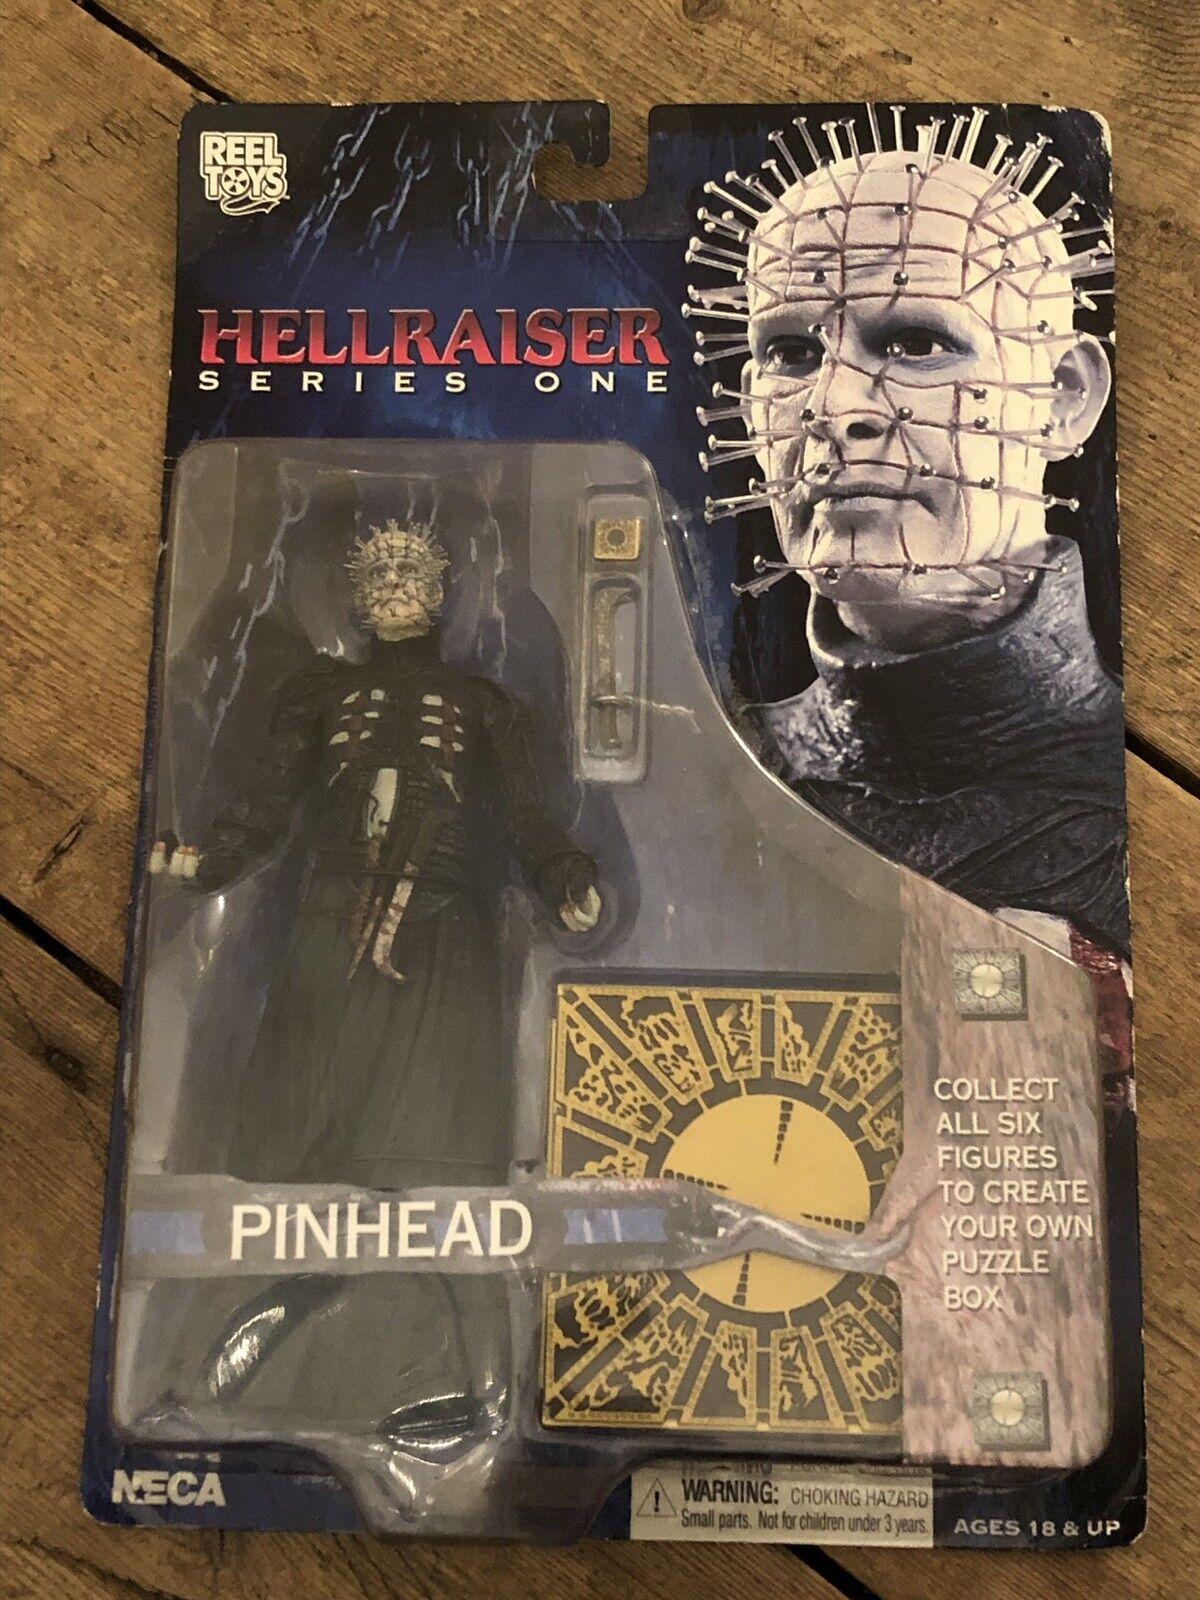 NECA Hellraiser Series 1 Pinhead afhrs 1 19